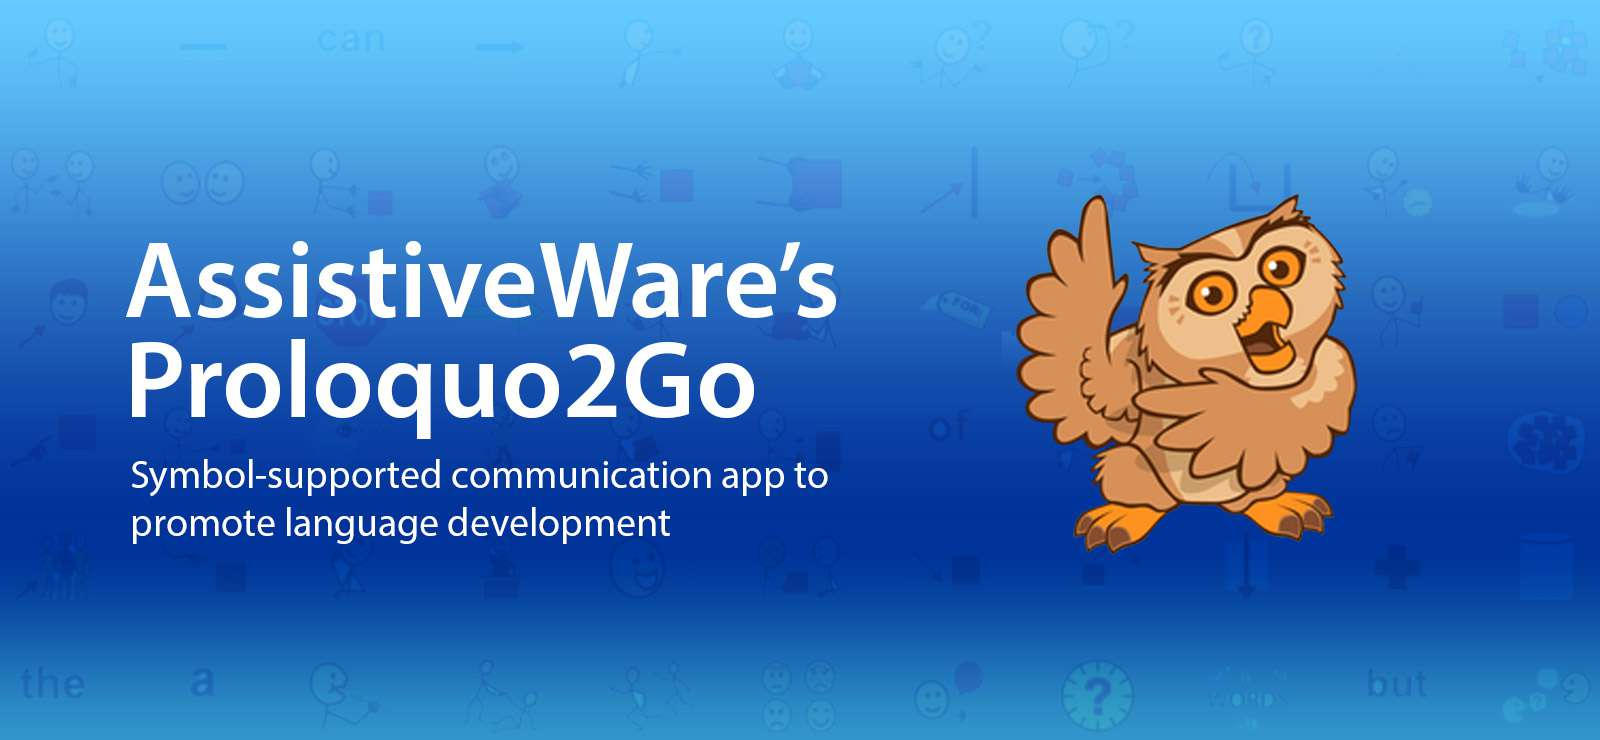 AssistiveWare's proloquo2go aac app